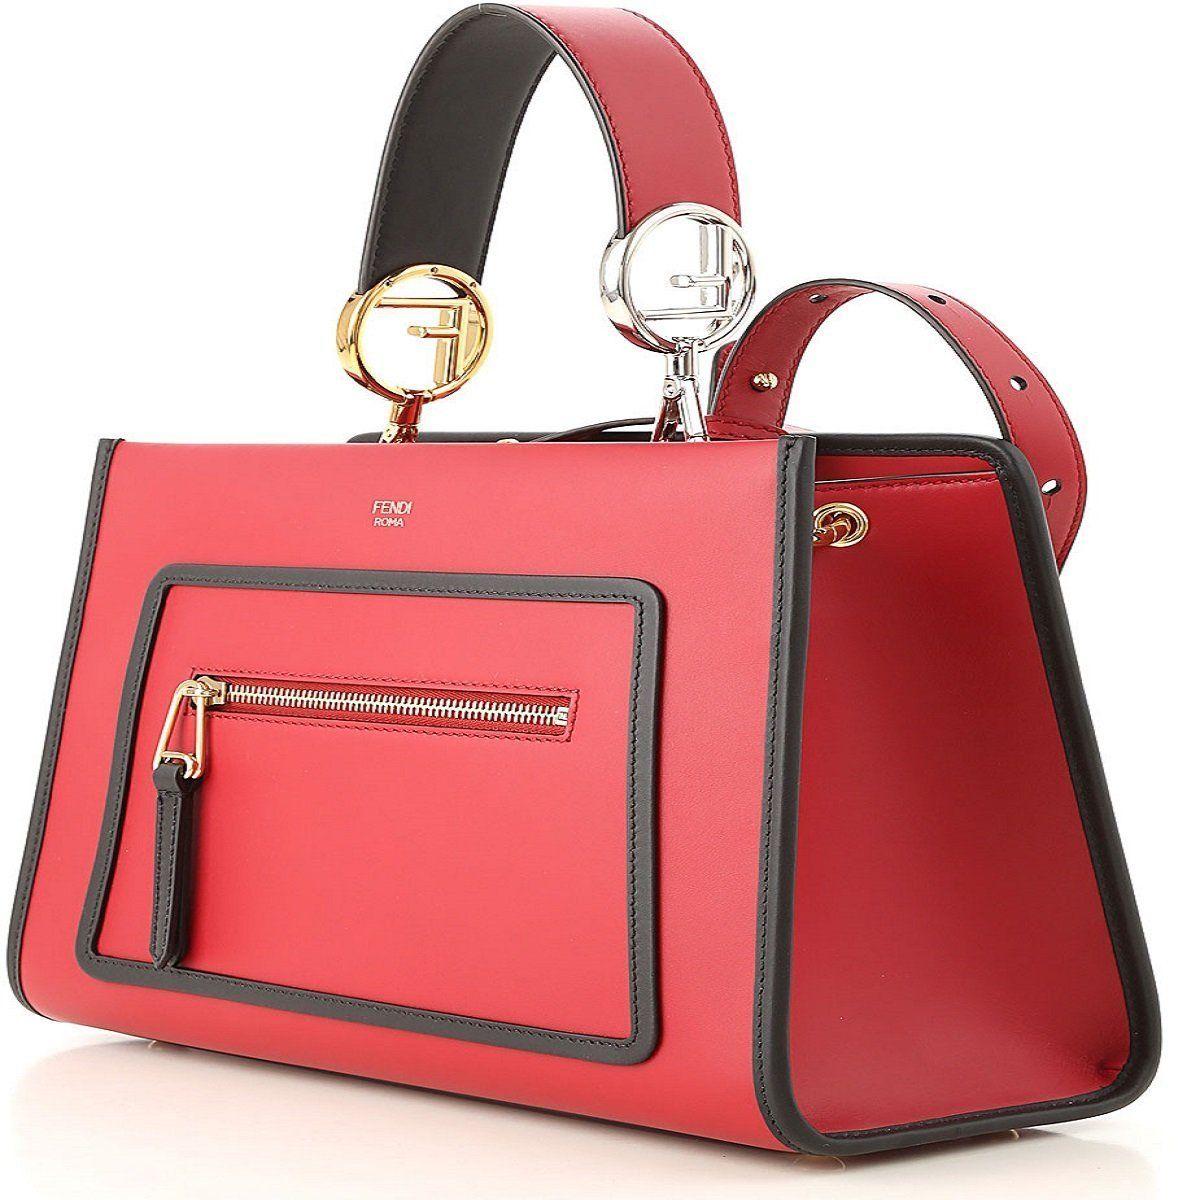 f19af0b32dc10f Fendi Red RUNAWAY Shoulder Hand-bag Calf Leather Shopping Tote 8BH344  #Fendi #TomFord #Luxury #QueenBeeofBeverlyHills #Handbags #Gucci  #DesignerHandbags ...